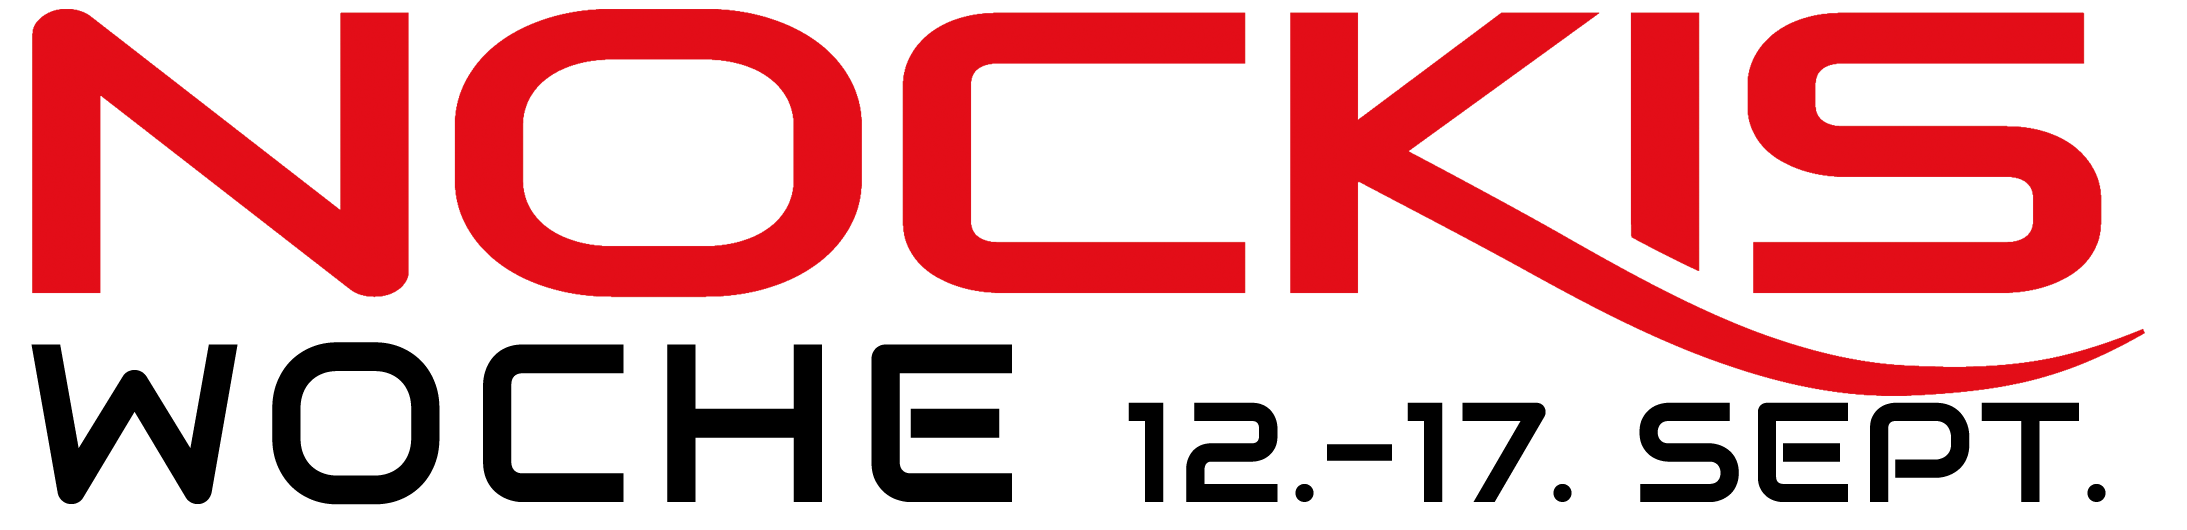 nockis_woche